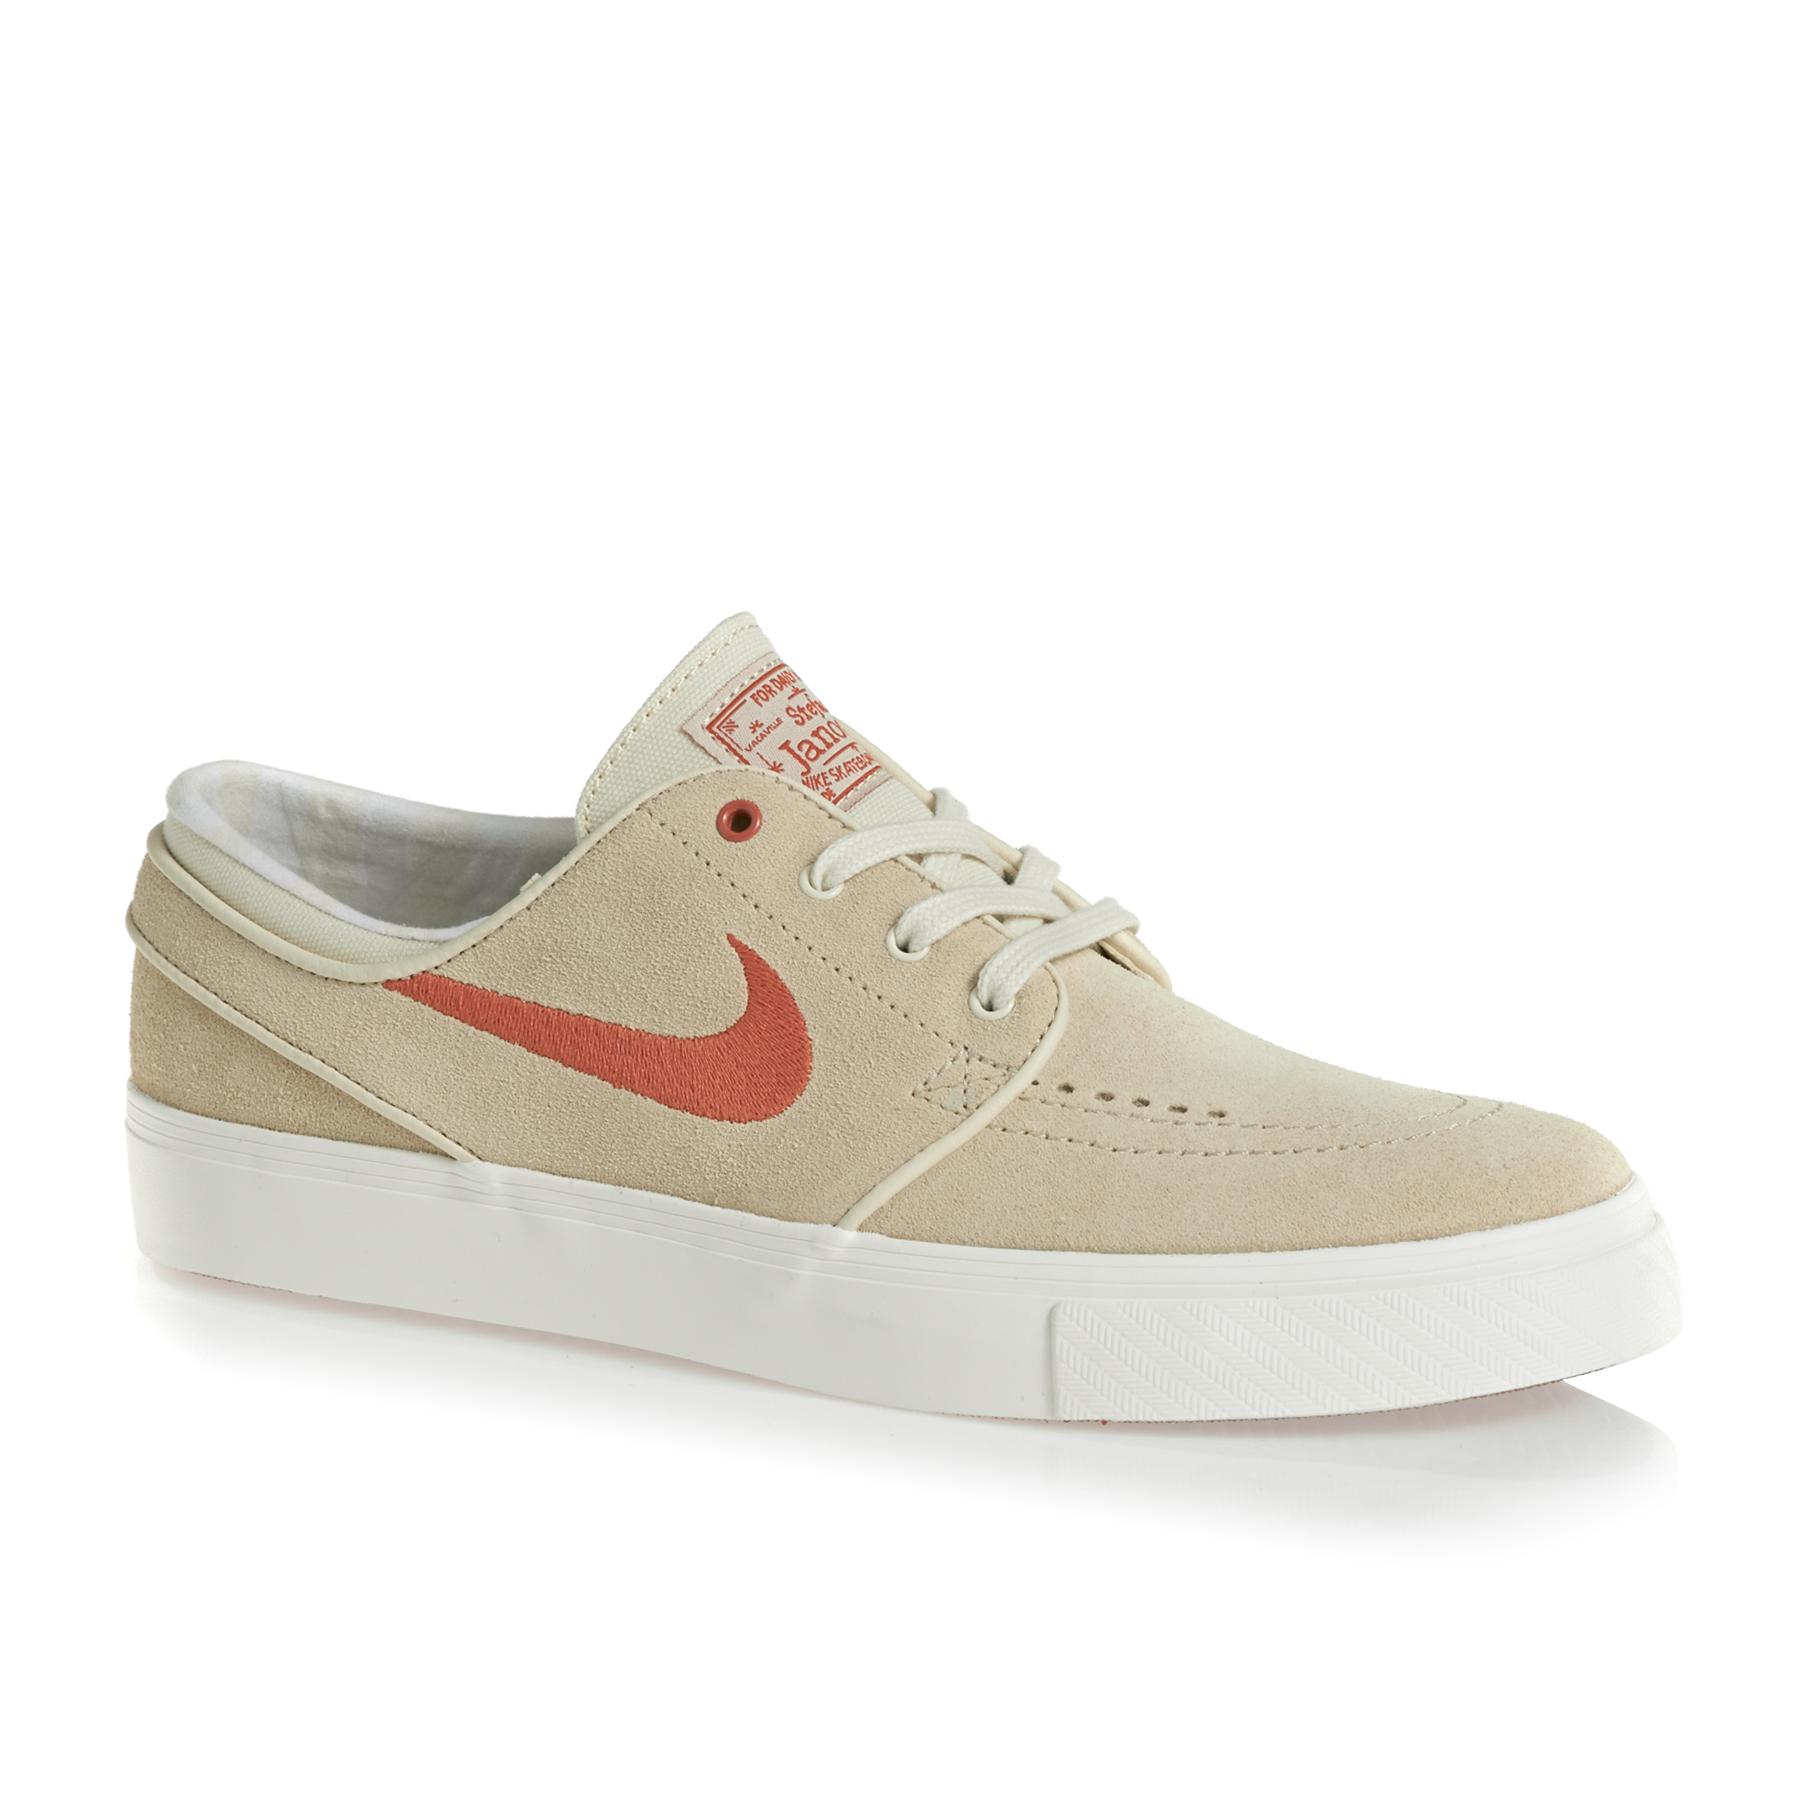 Scarpe Nike SB Zoom Stefan Janoski Suede disponibile su